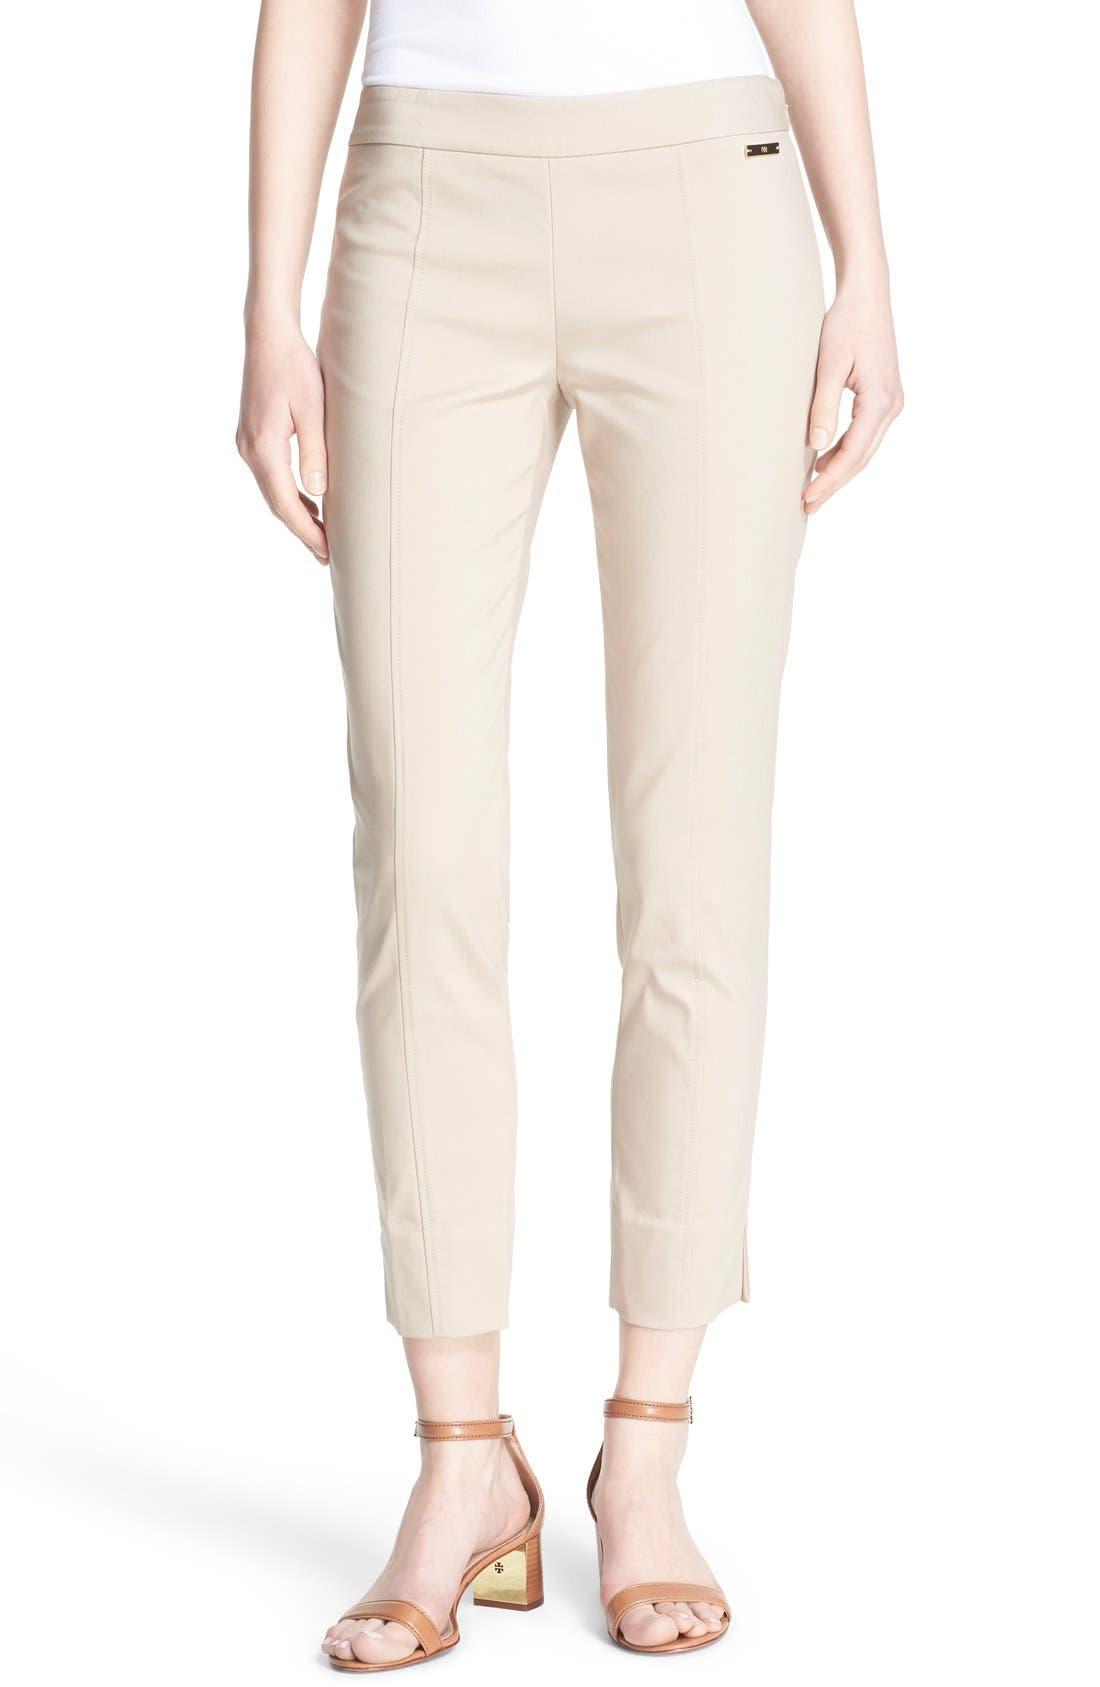 Alternate Image 1 Selected - Tory Burch 'Callie' Seamed Crop Pants